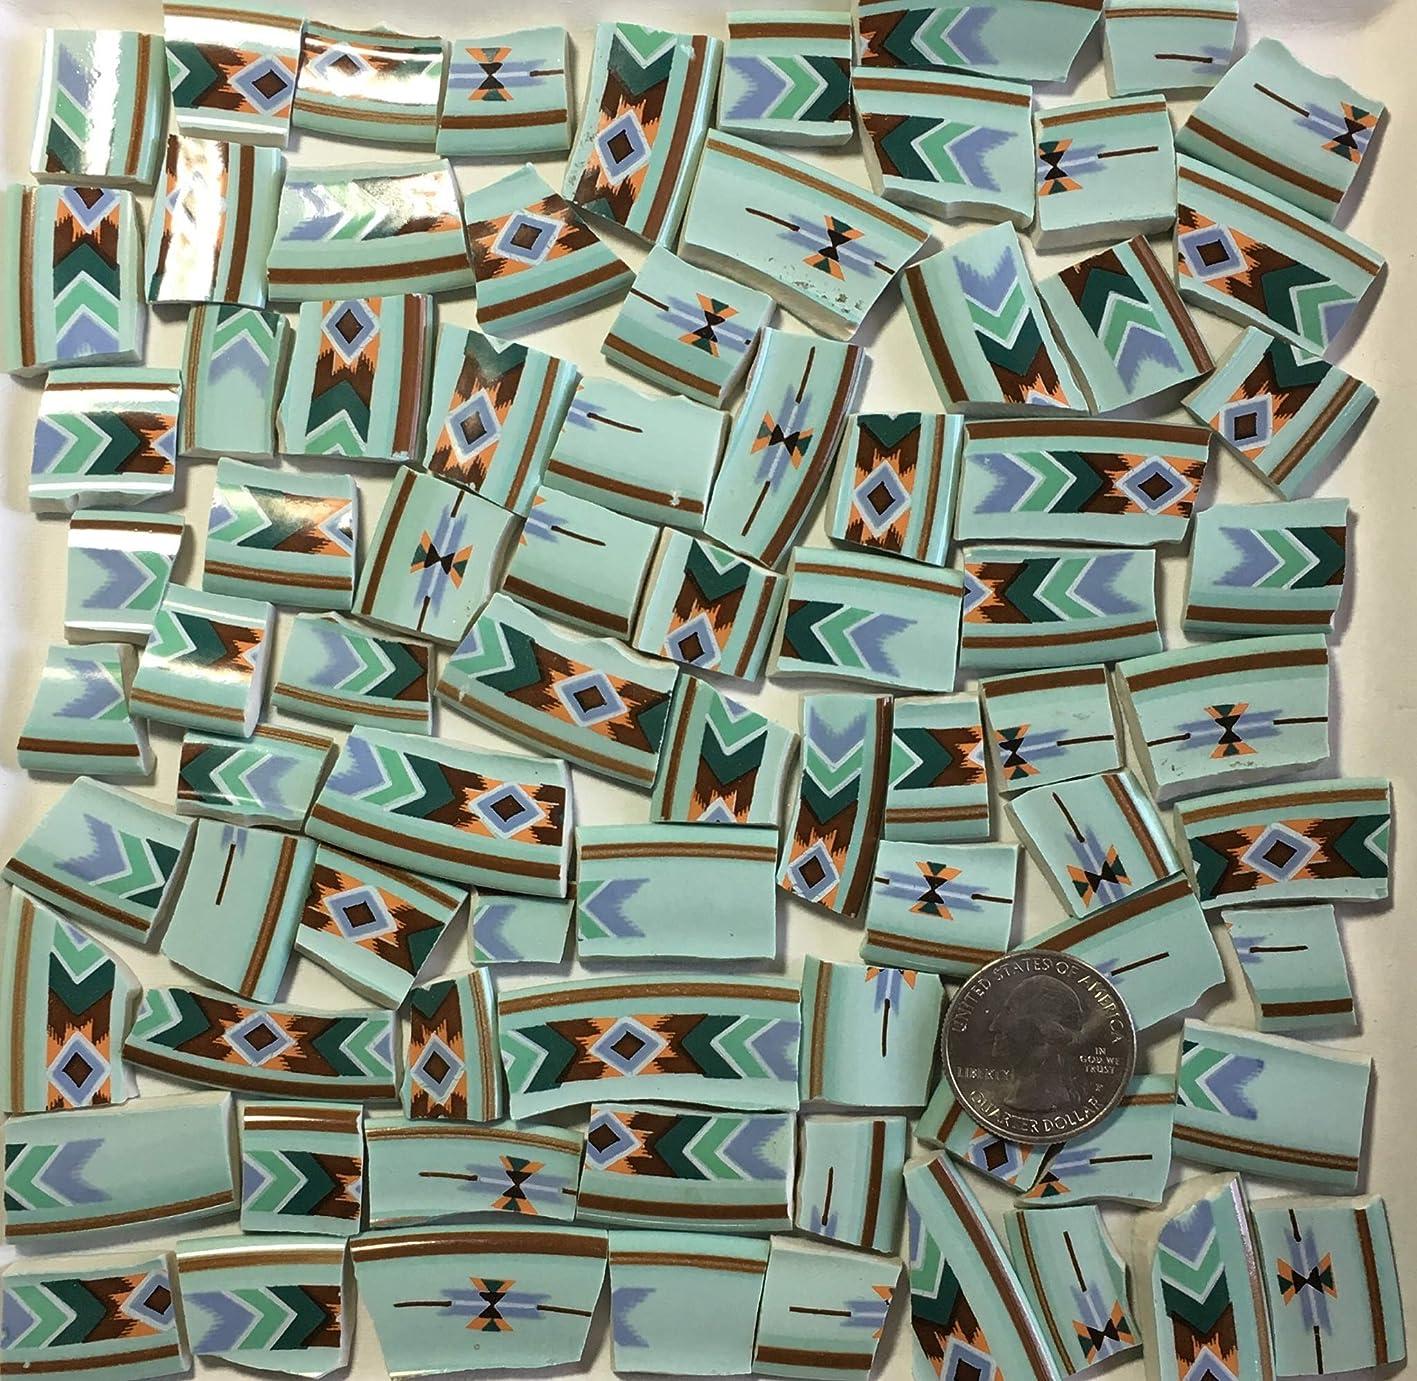 Mosaic Art & Craft Supply ~ Southwest Design Turquoise Blue Rim Tiles (A687) xrecnkkyumo685